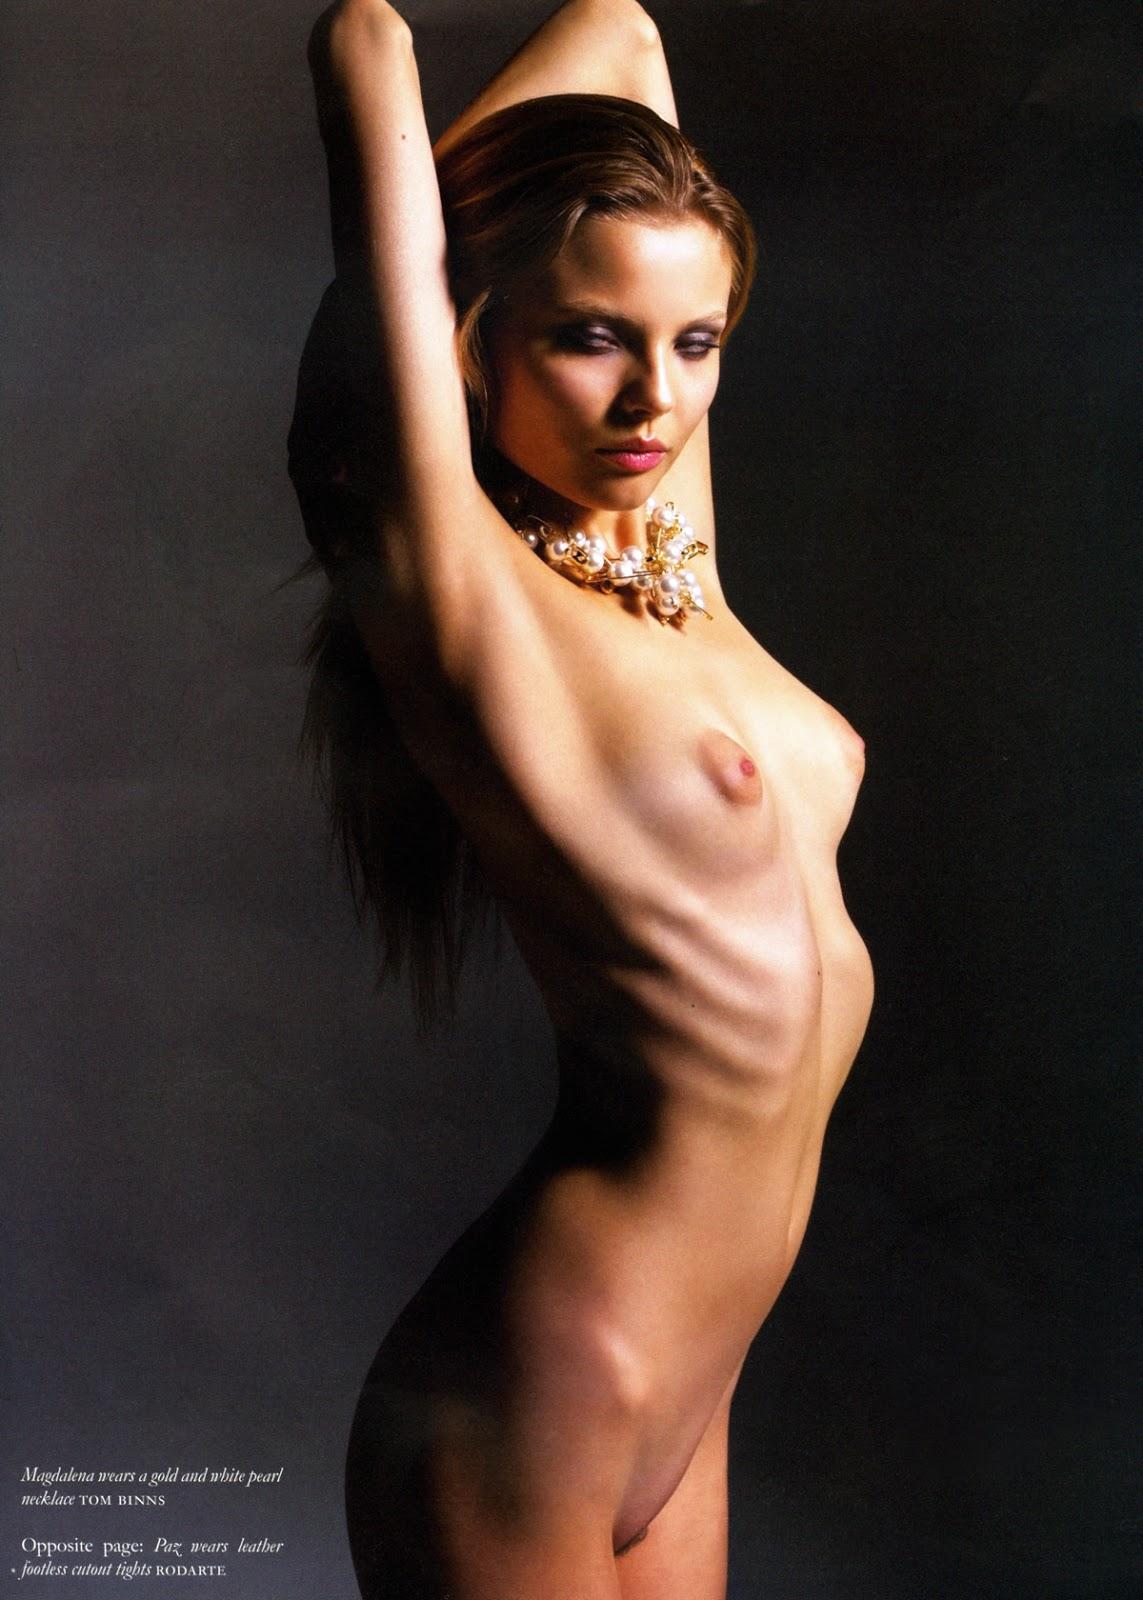 Official model mayhem page of Magdalena Perlinska; member since Jun 27, has 15 images, friends on Model Mayhem.